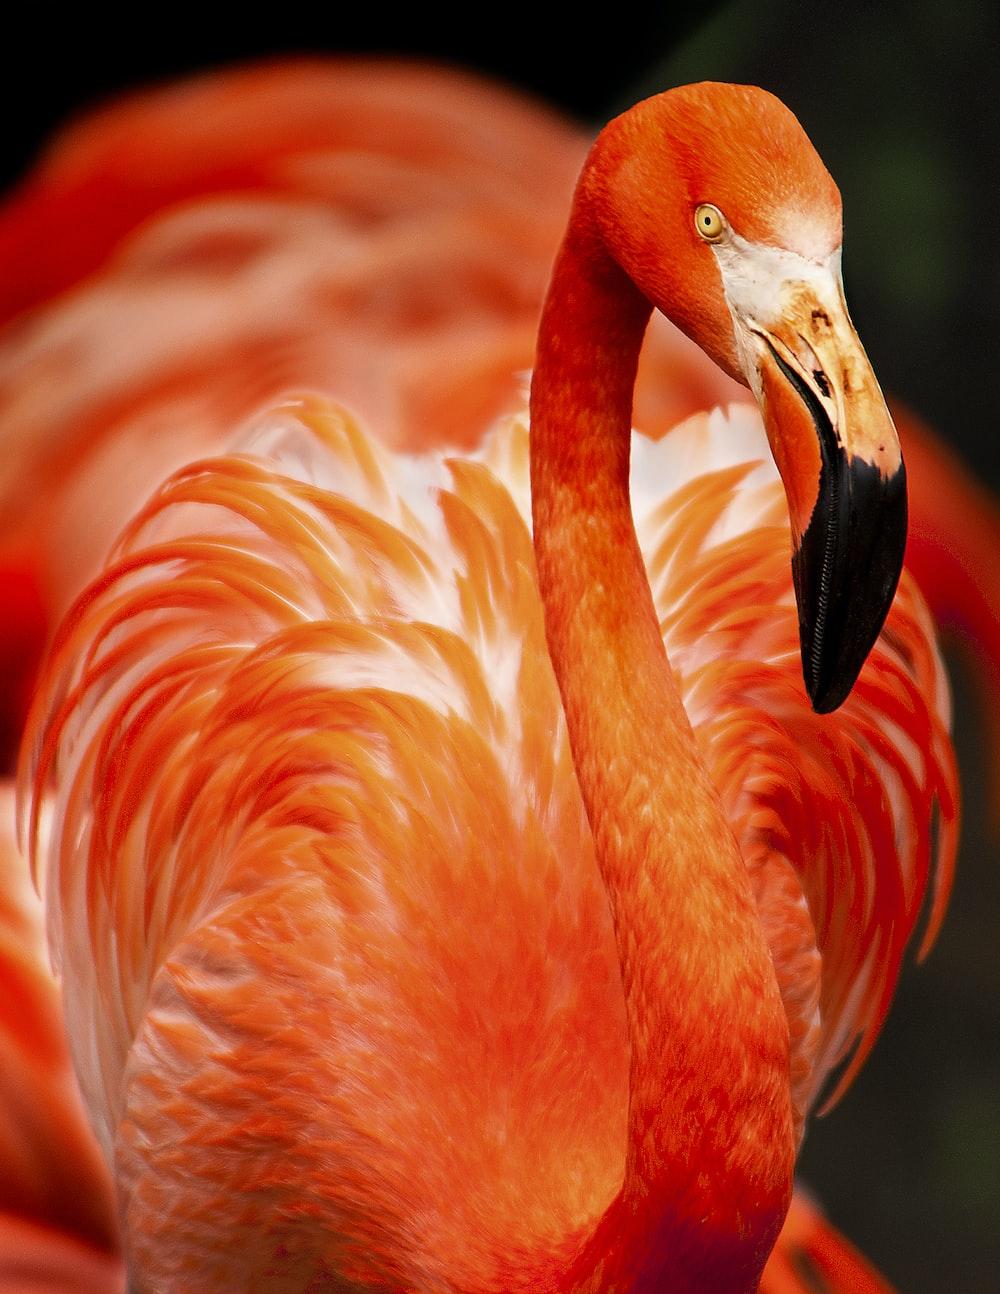 closeup photo of orange bird